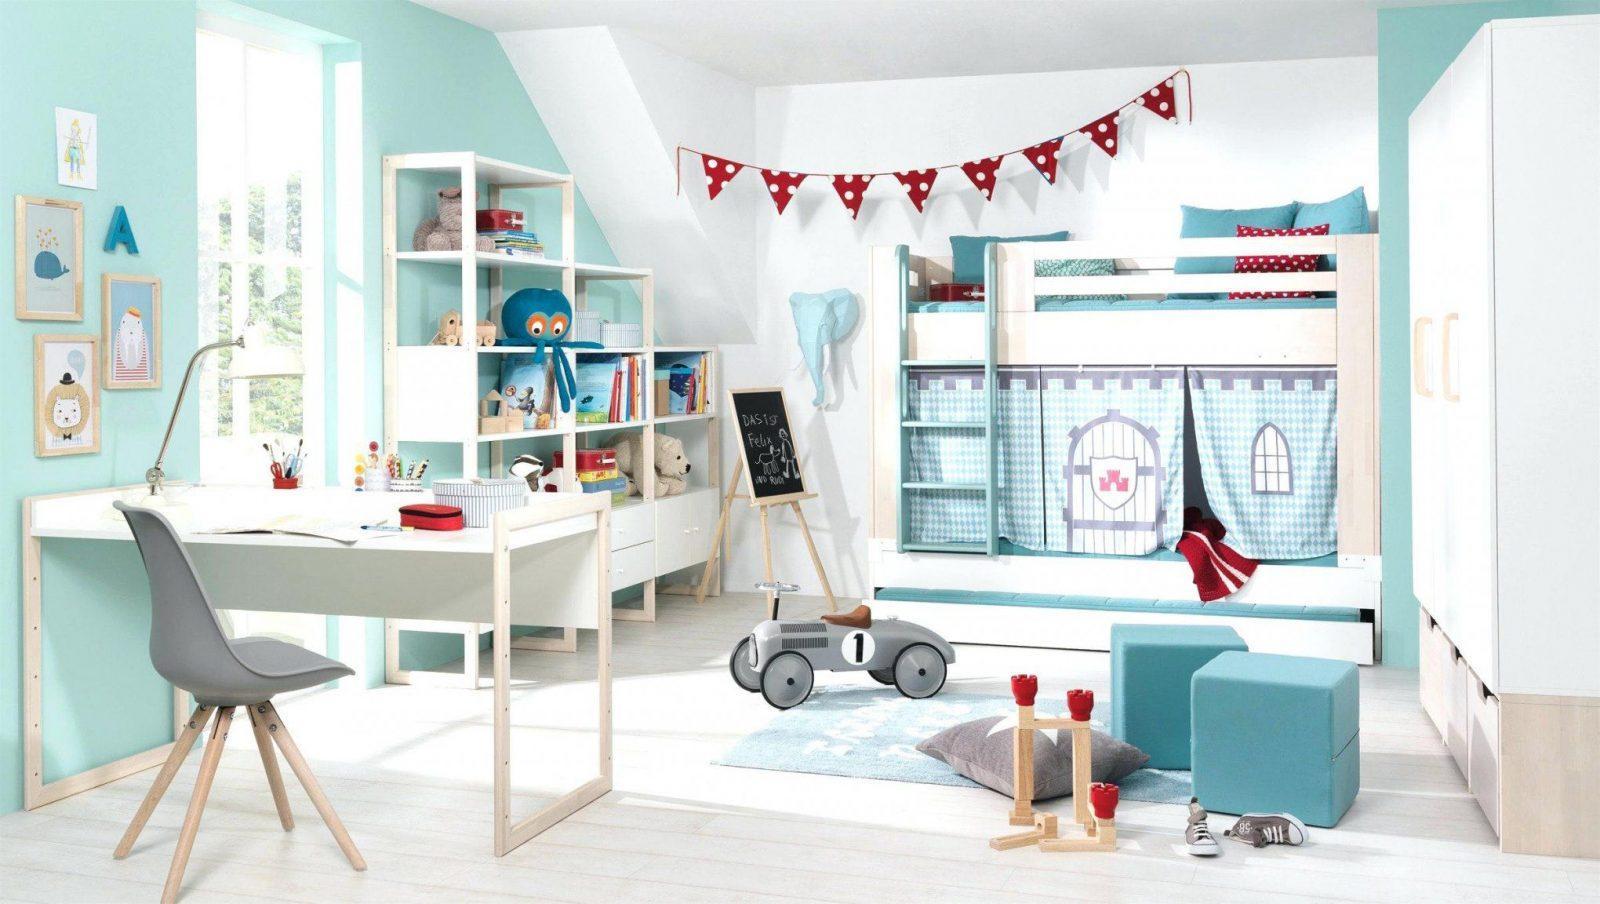 jugend zimmer jugendzimmer wandgestaltung jungen jungen avec von diy ideen f r jugendzimmer. Black Bedroom Furniture Sets. Home Design Ideas